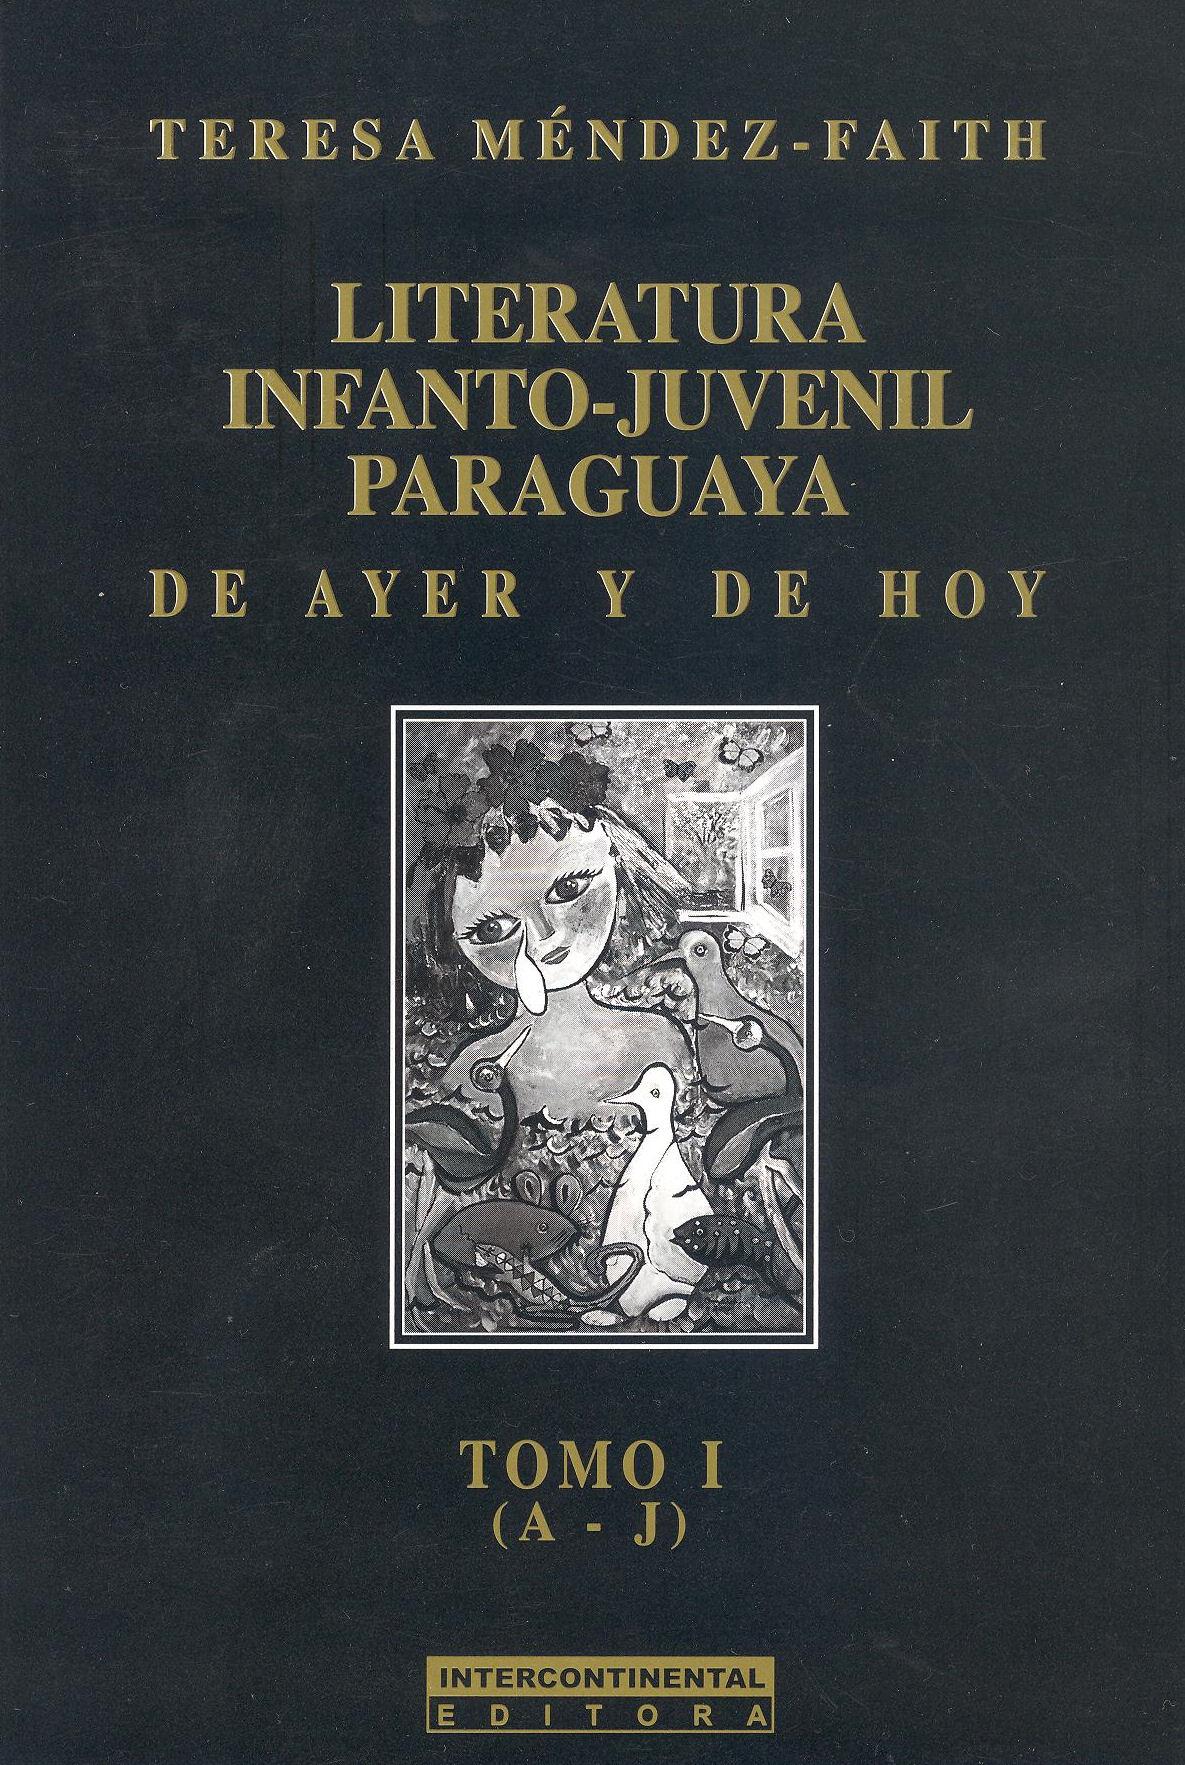 2011 Literatura Infanto-Juvenil